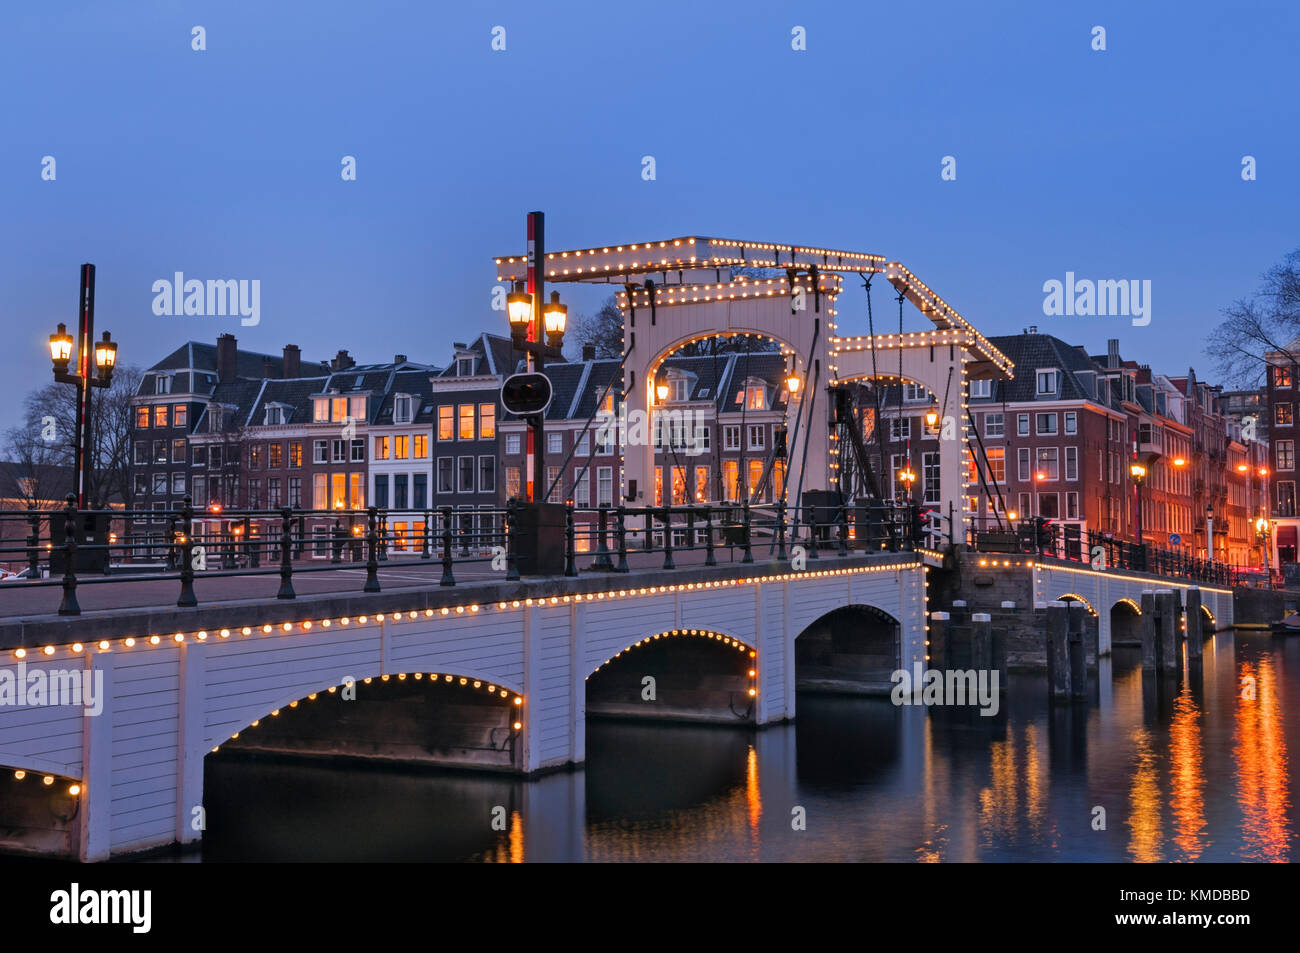 Magere Brug or Skinny Bridge Amsterdam Holland - Stock Image